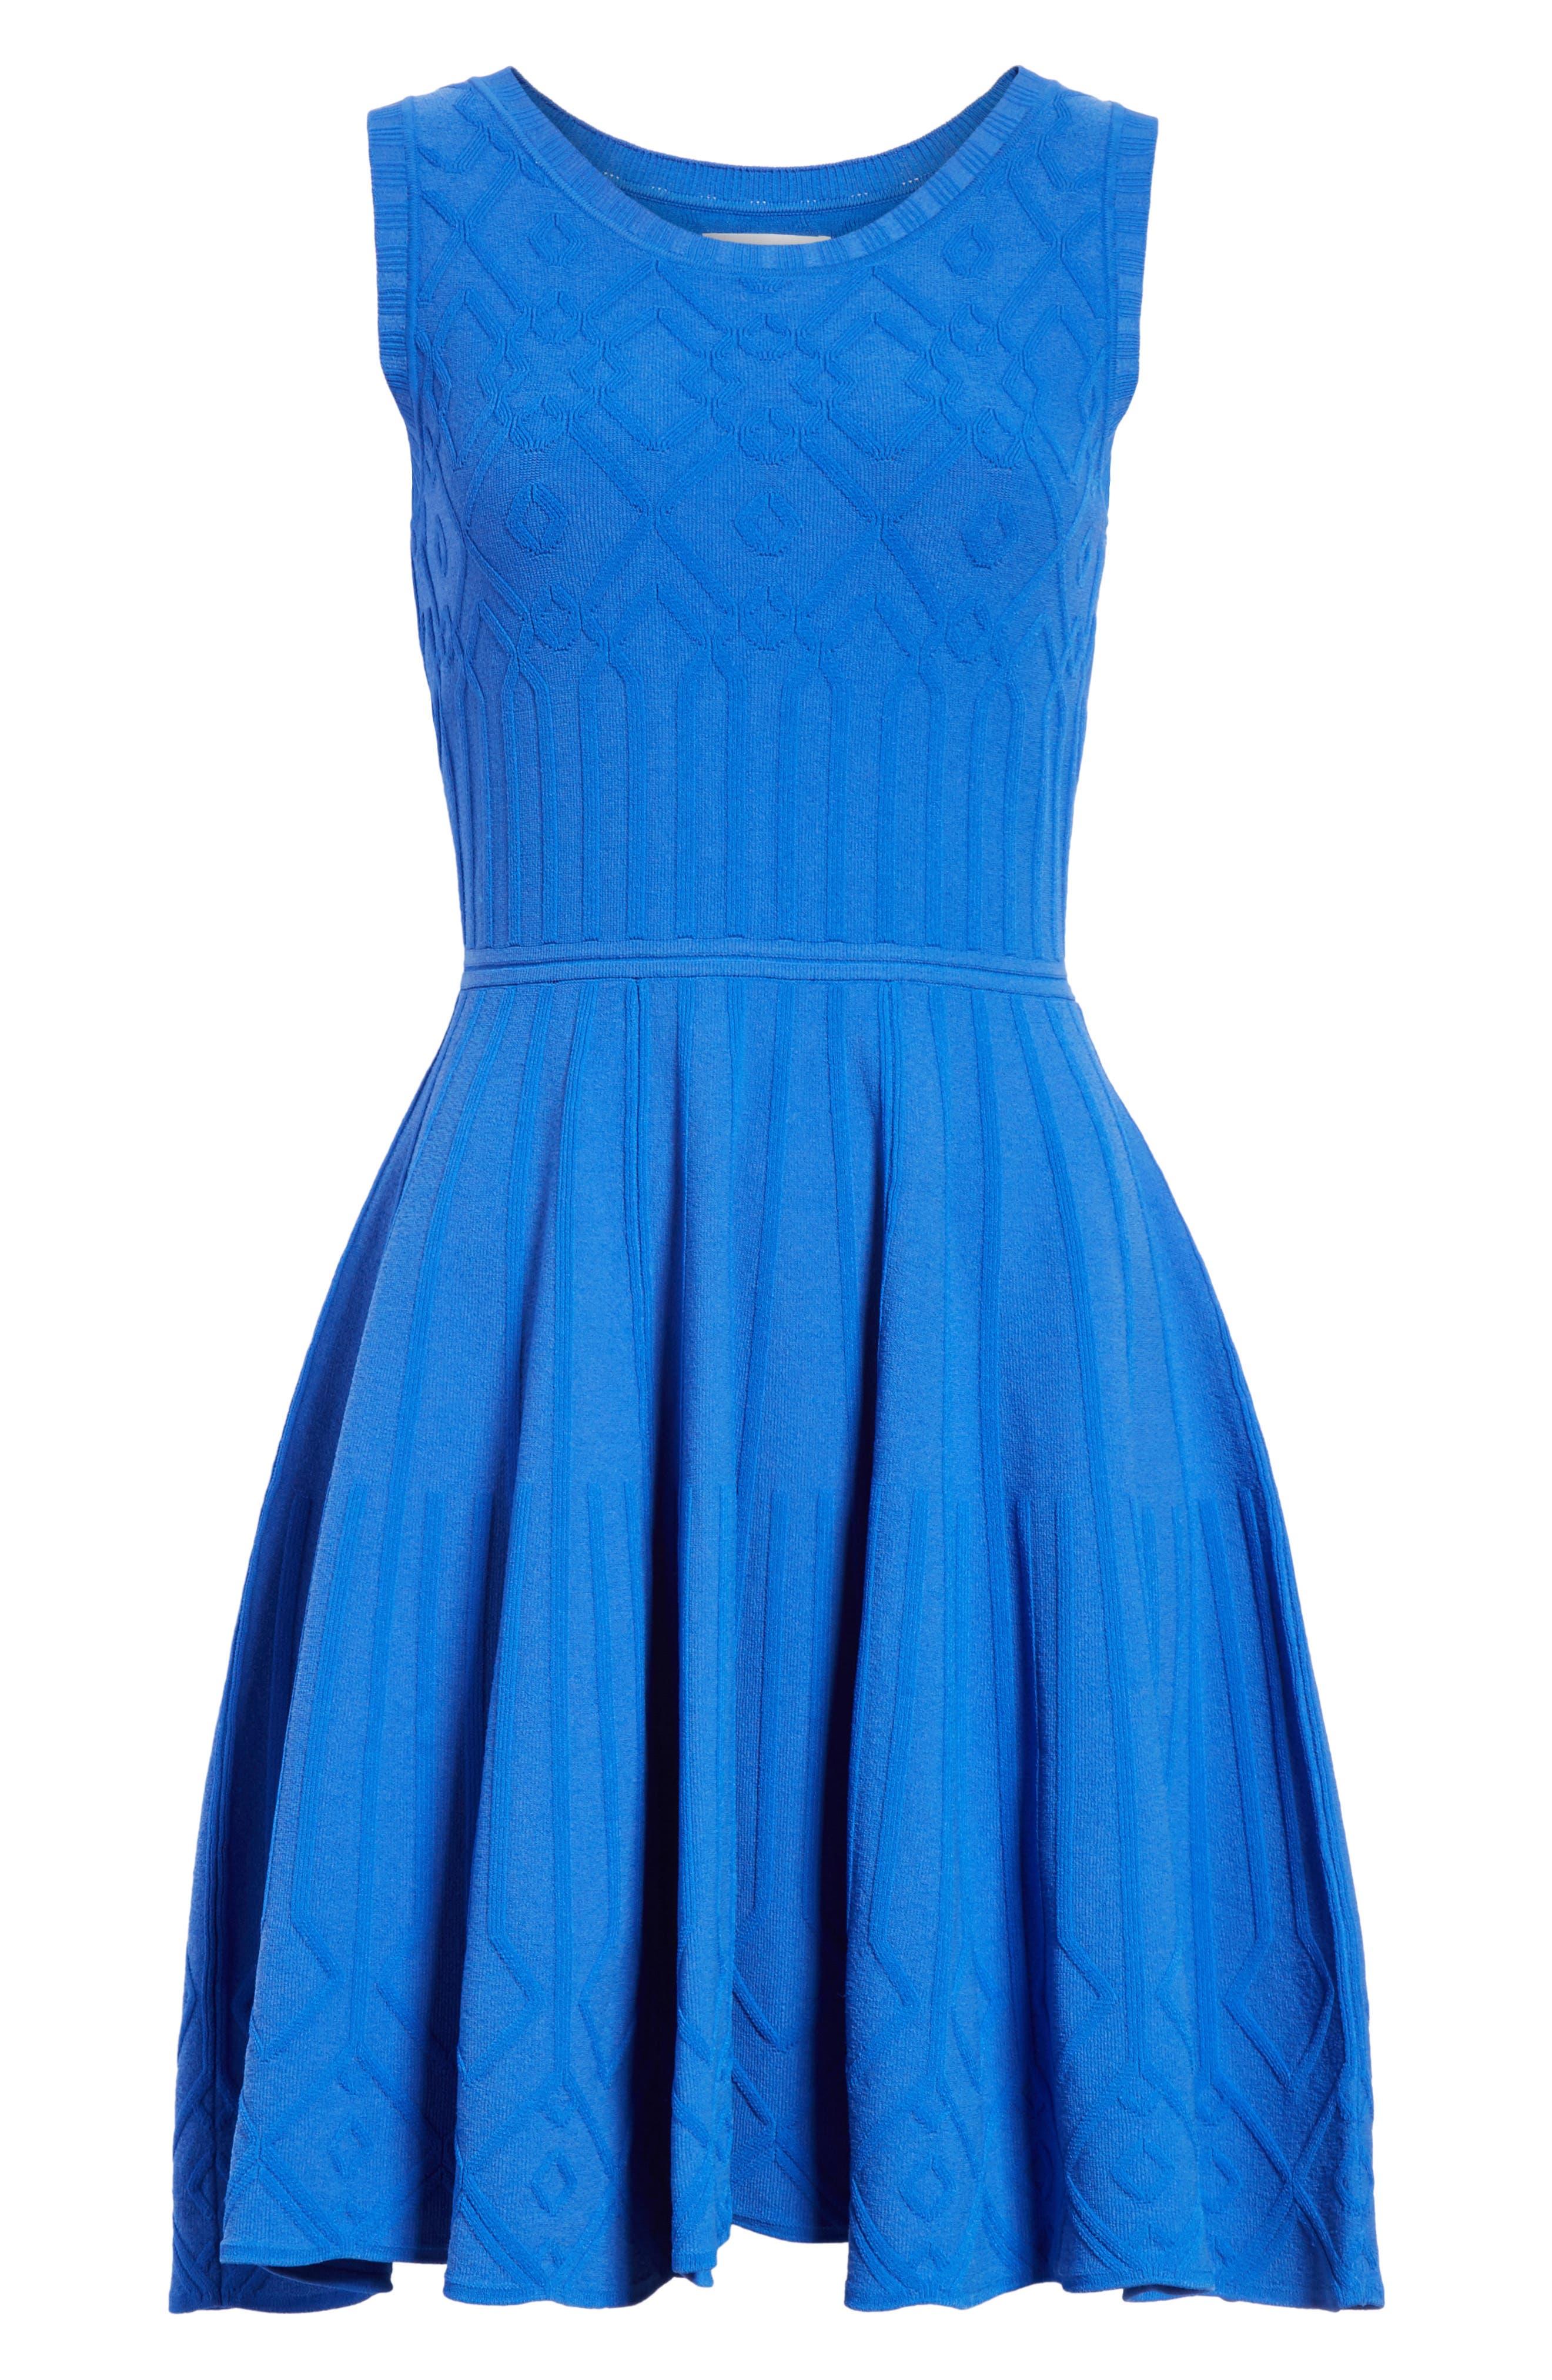 Mosaic Texture Knit Fit & Flare Dress,                             Alternate thumbnail 6, color,                             Blueberry